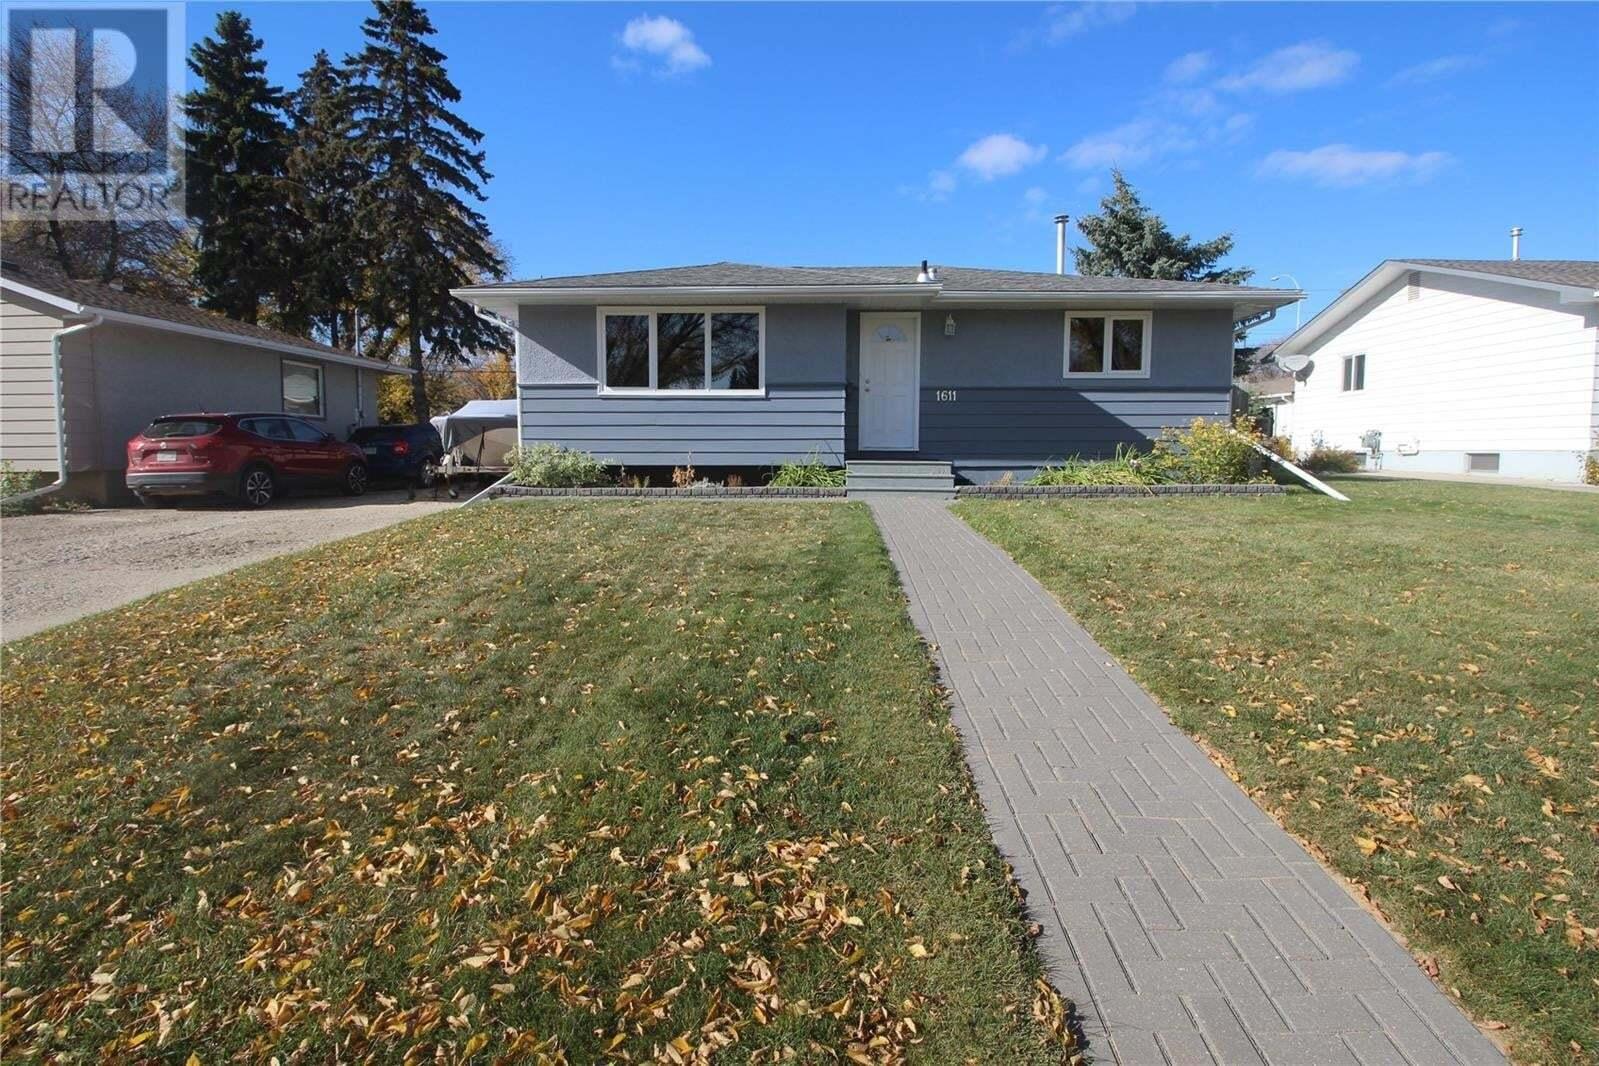 House for sale at 1611 8th Ave N Saskatoon Saskatchewan - MLS: SK829032